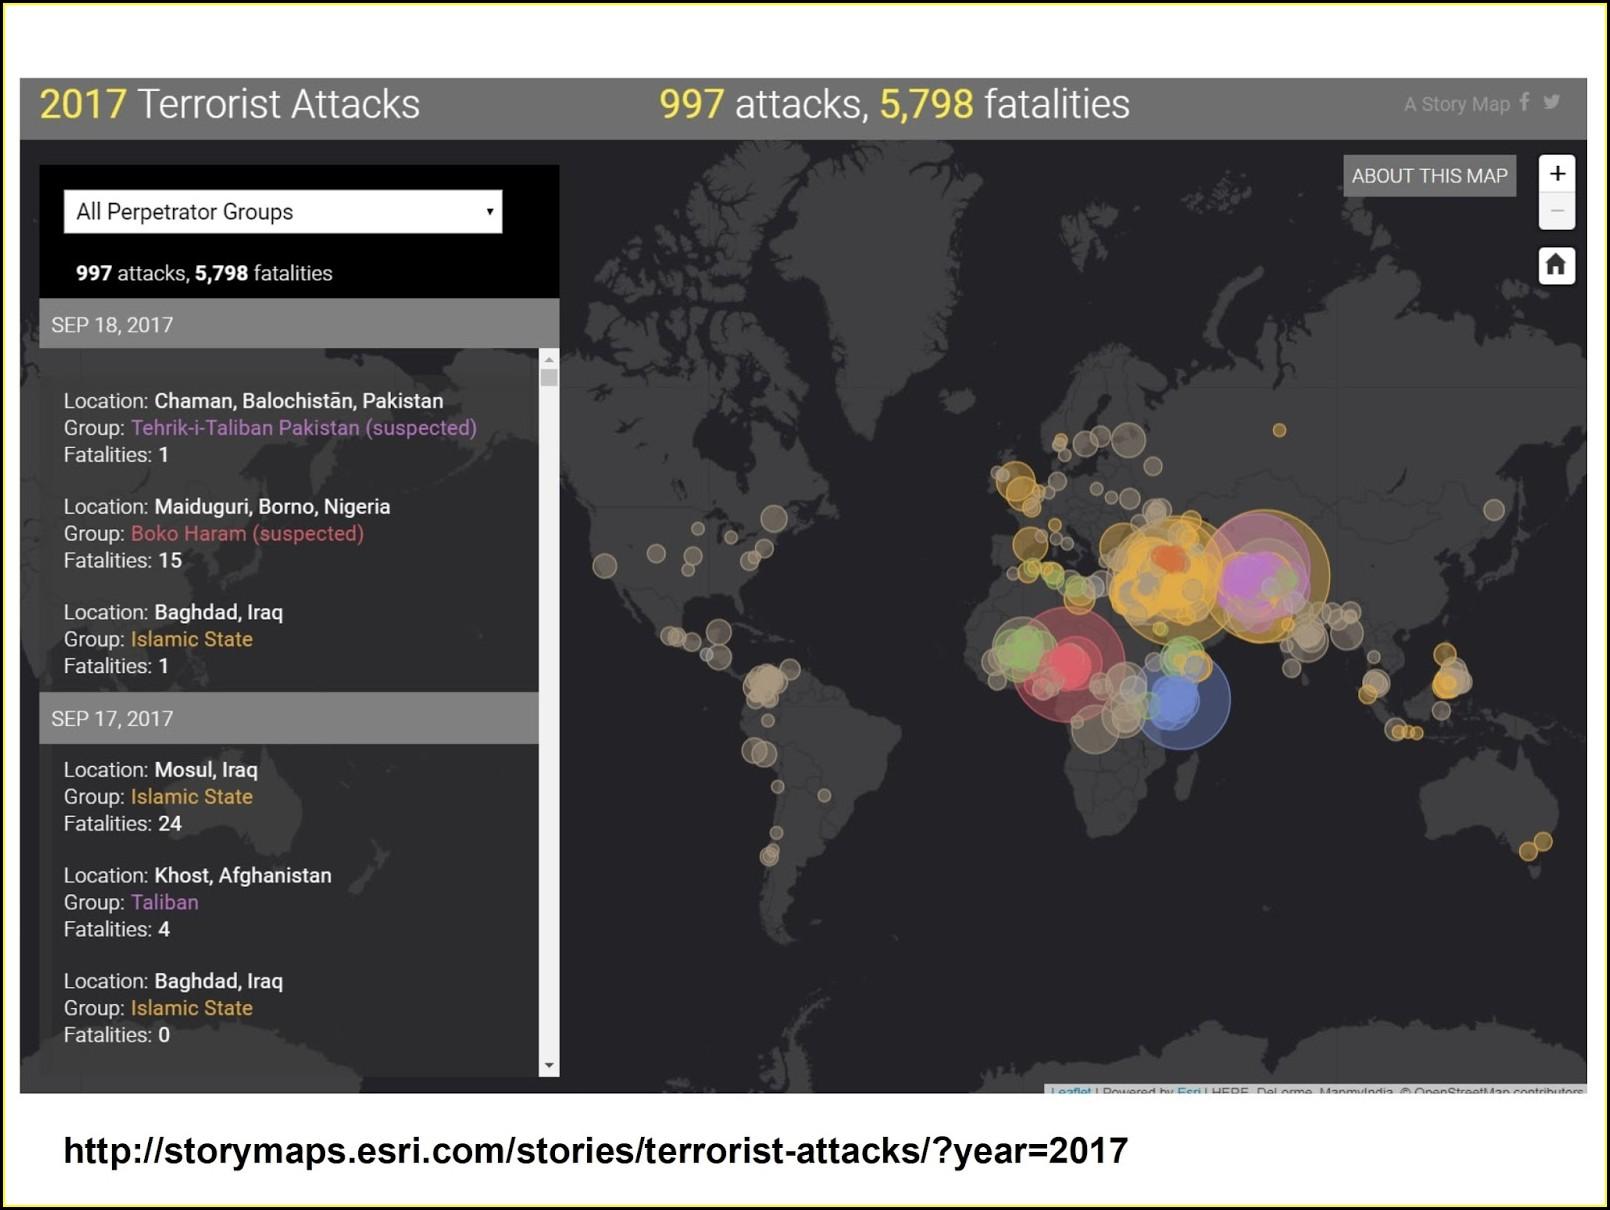 Esri Story Maps Terrorism